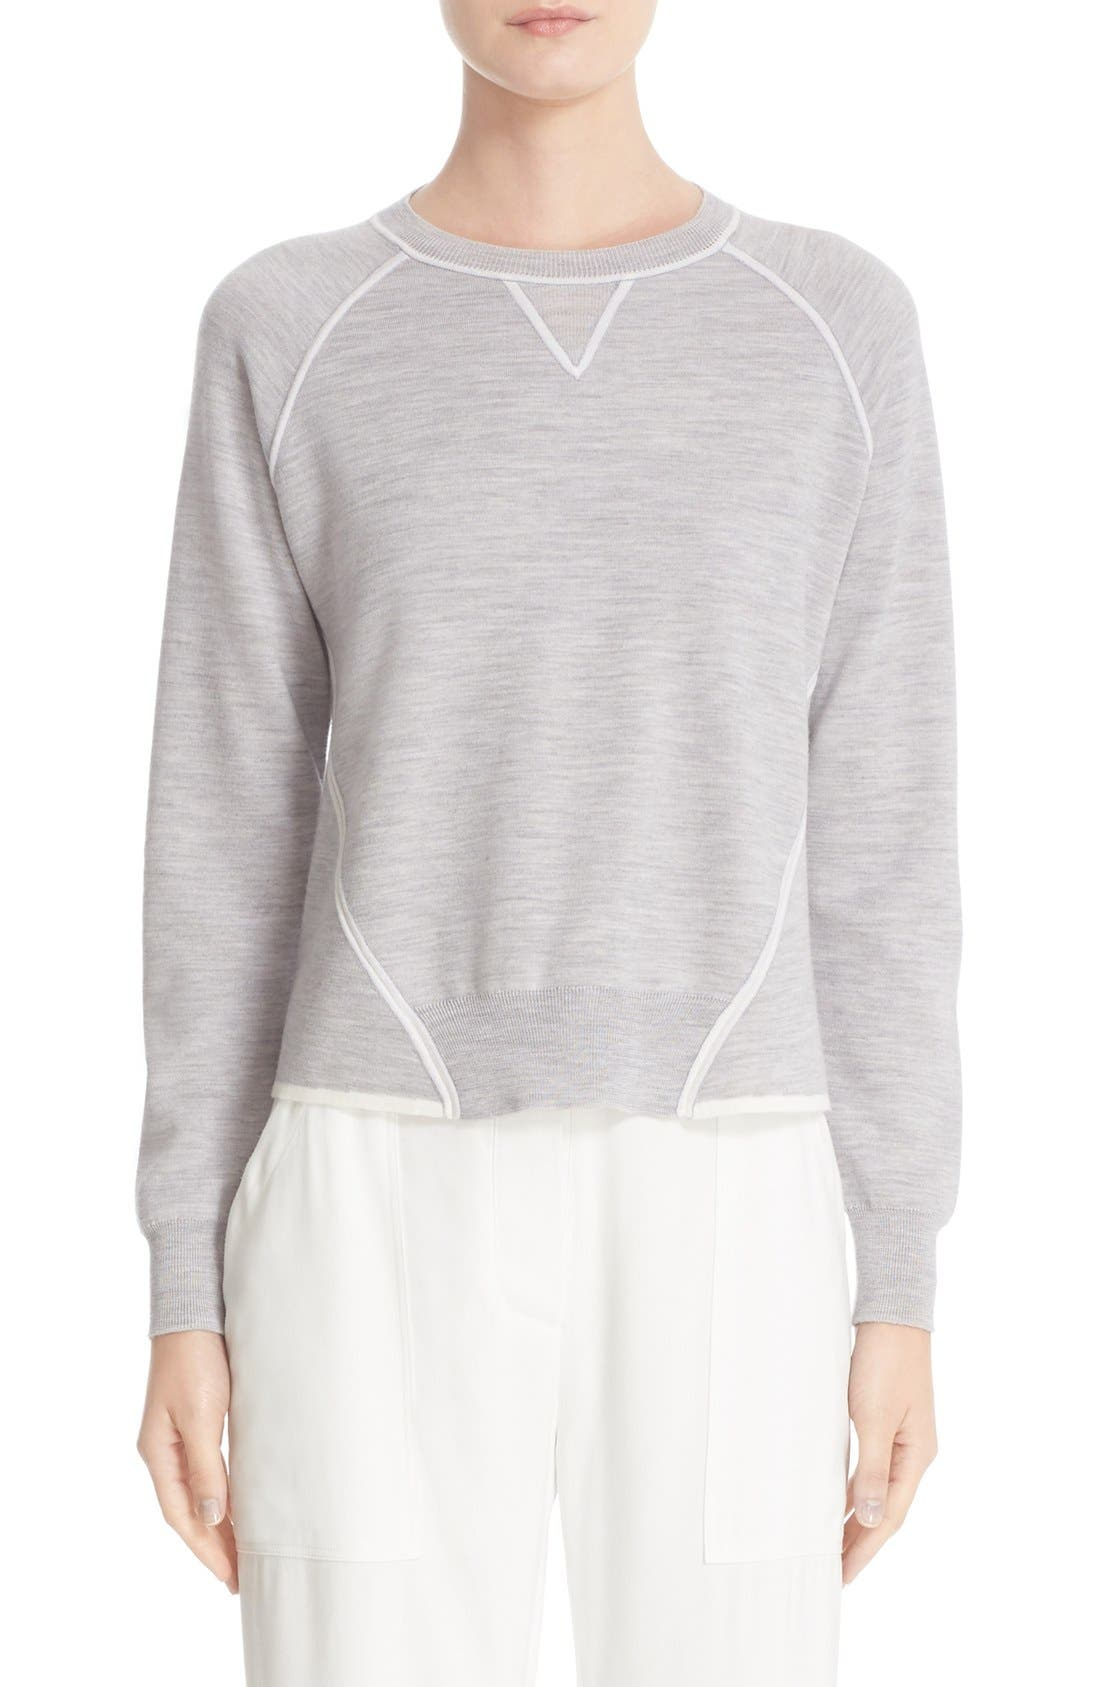 ADAM LIPPES Contrast Detail Merino Wool Sweatshirt